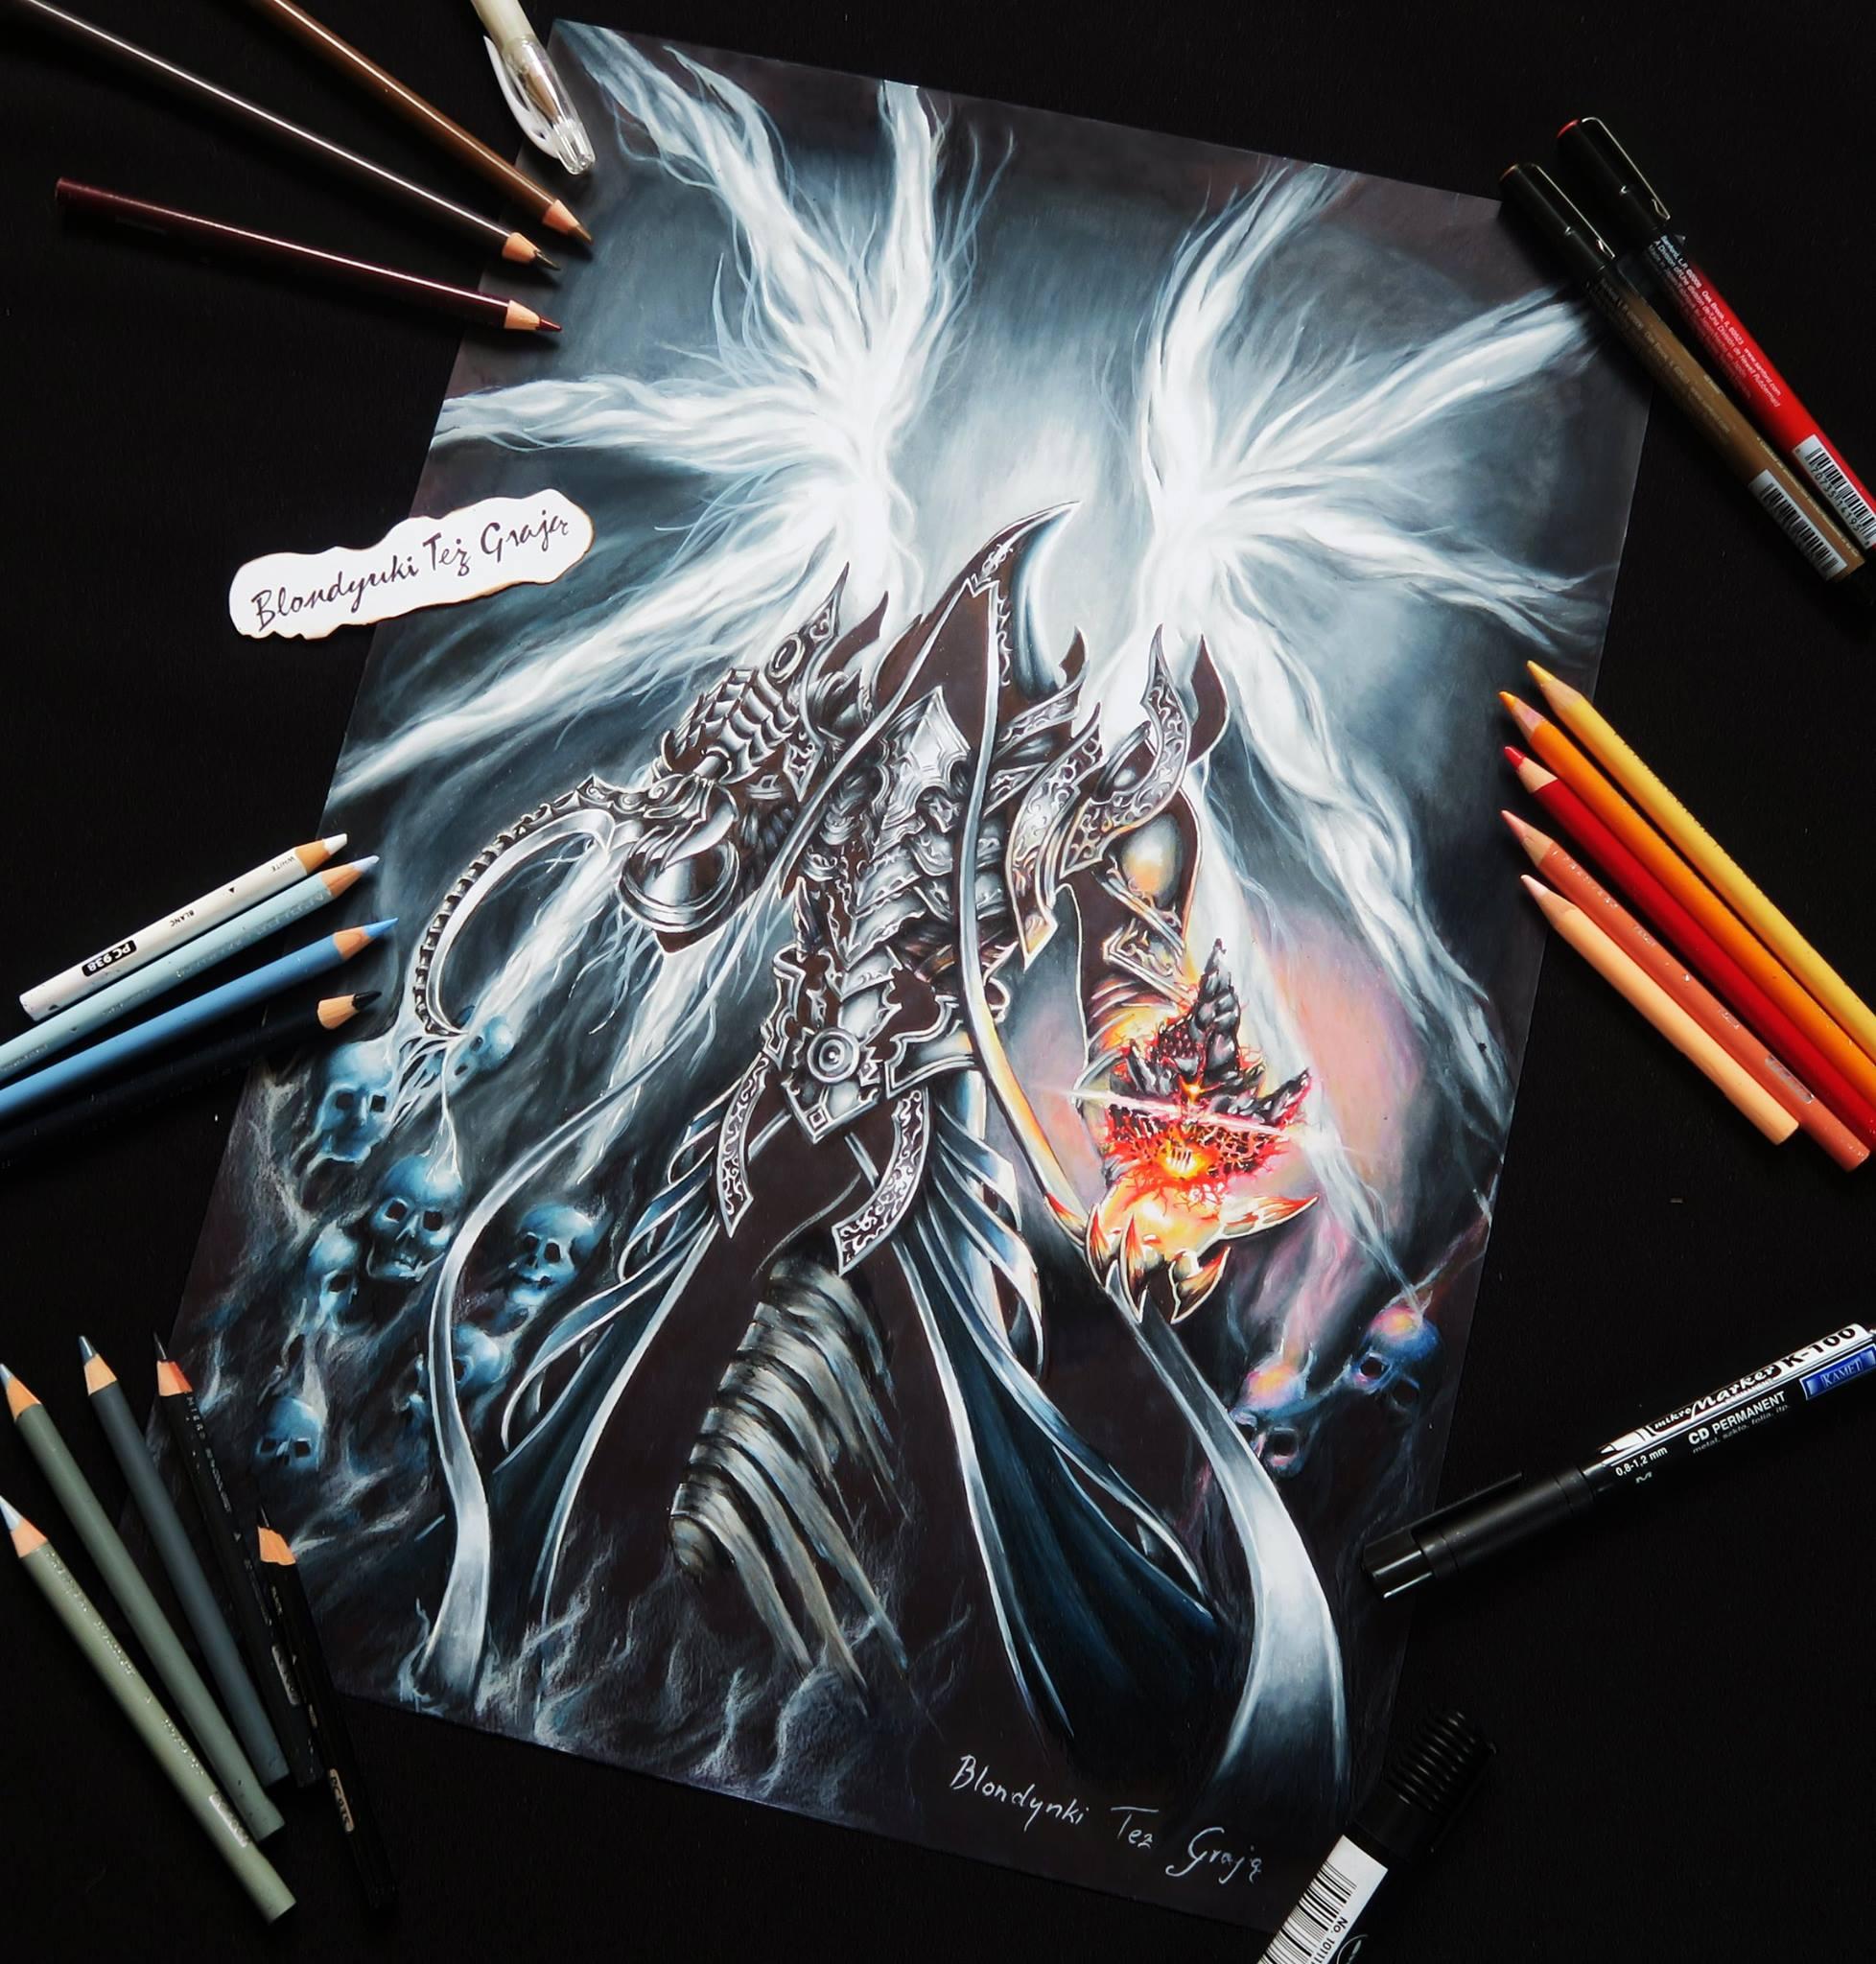 Malthael drawing by Blondynki Też Grają - Diablo art